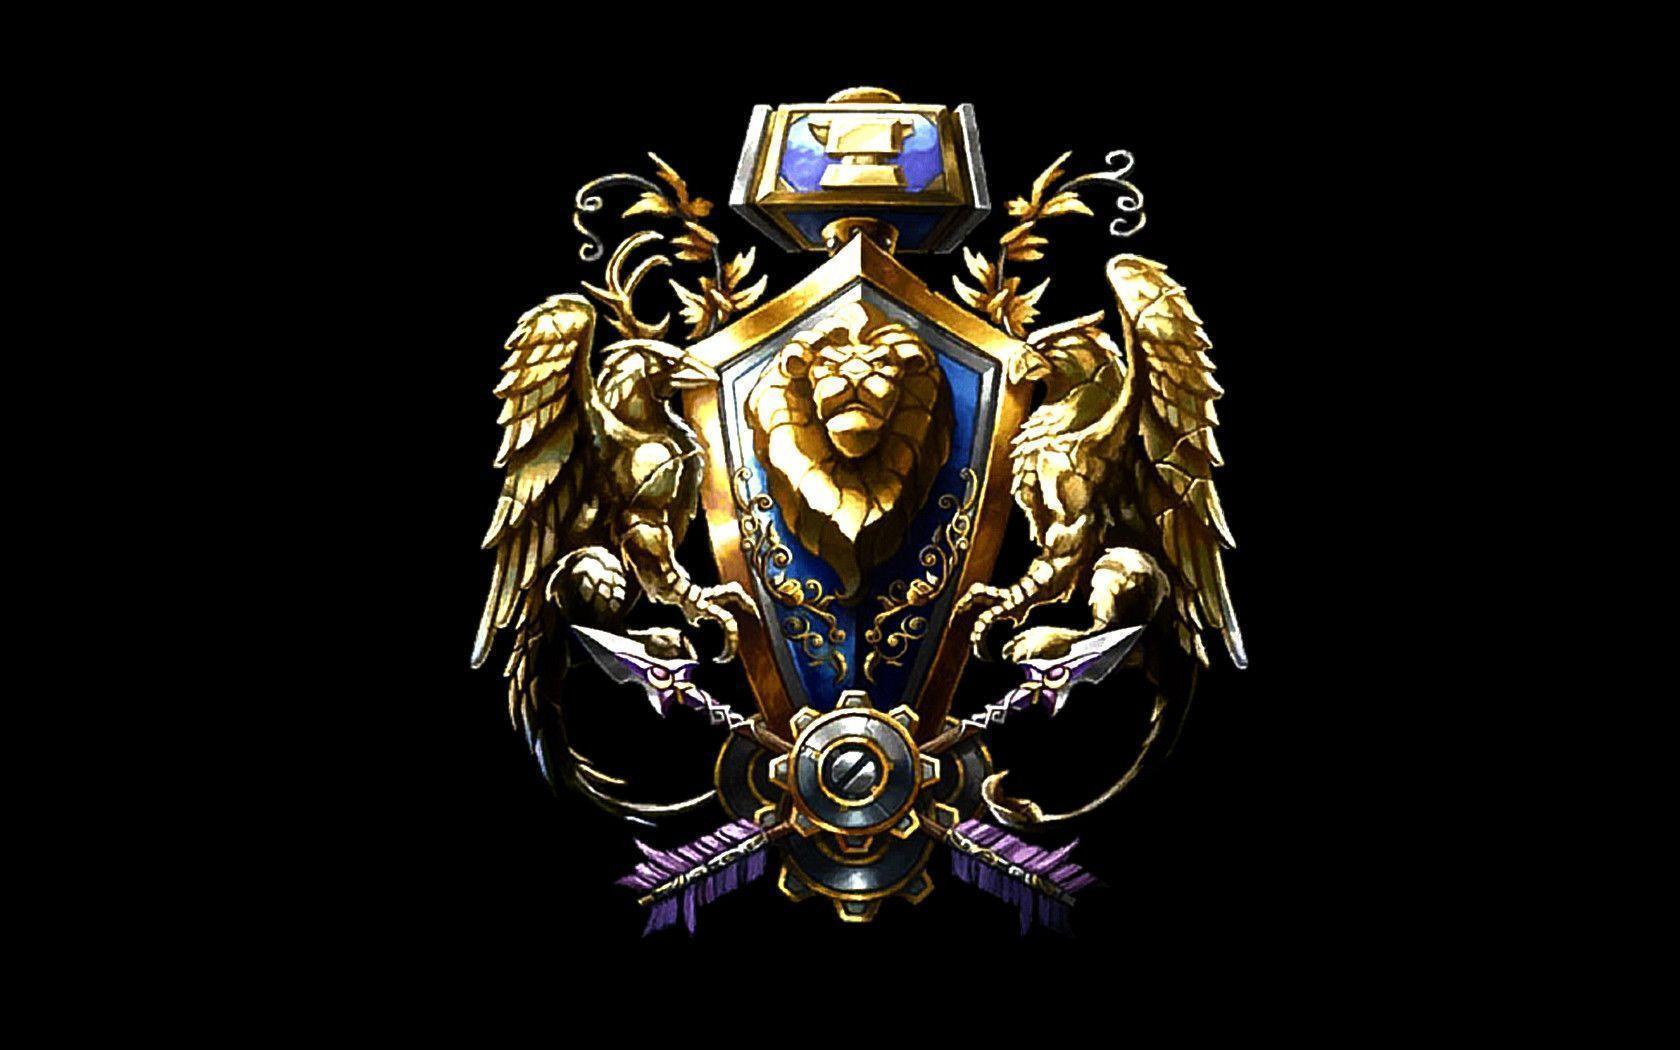 Download World Of Warcraft Wallpaper Alliance #101 Wallpaper HD ...